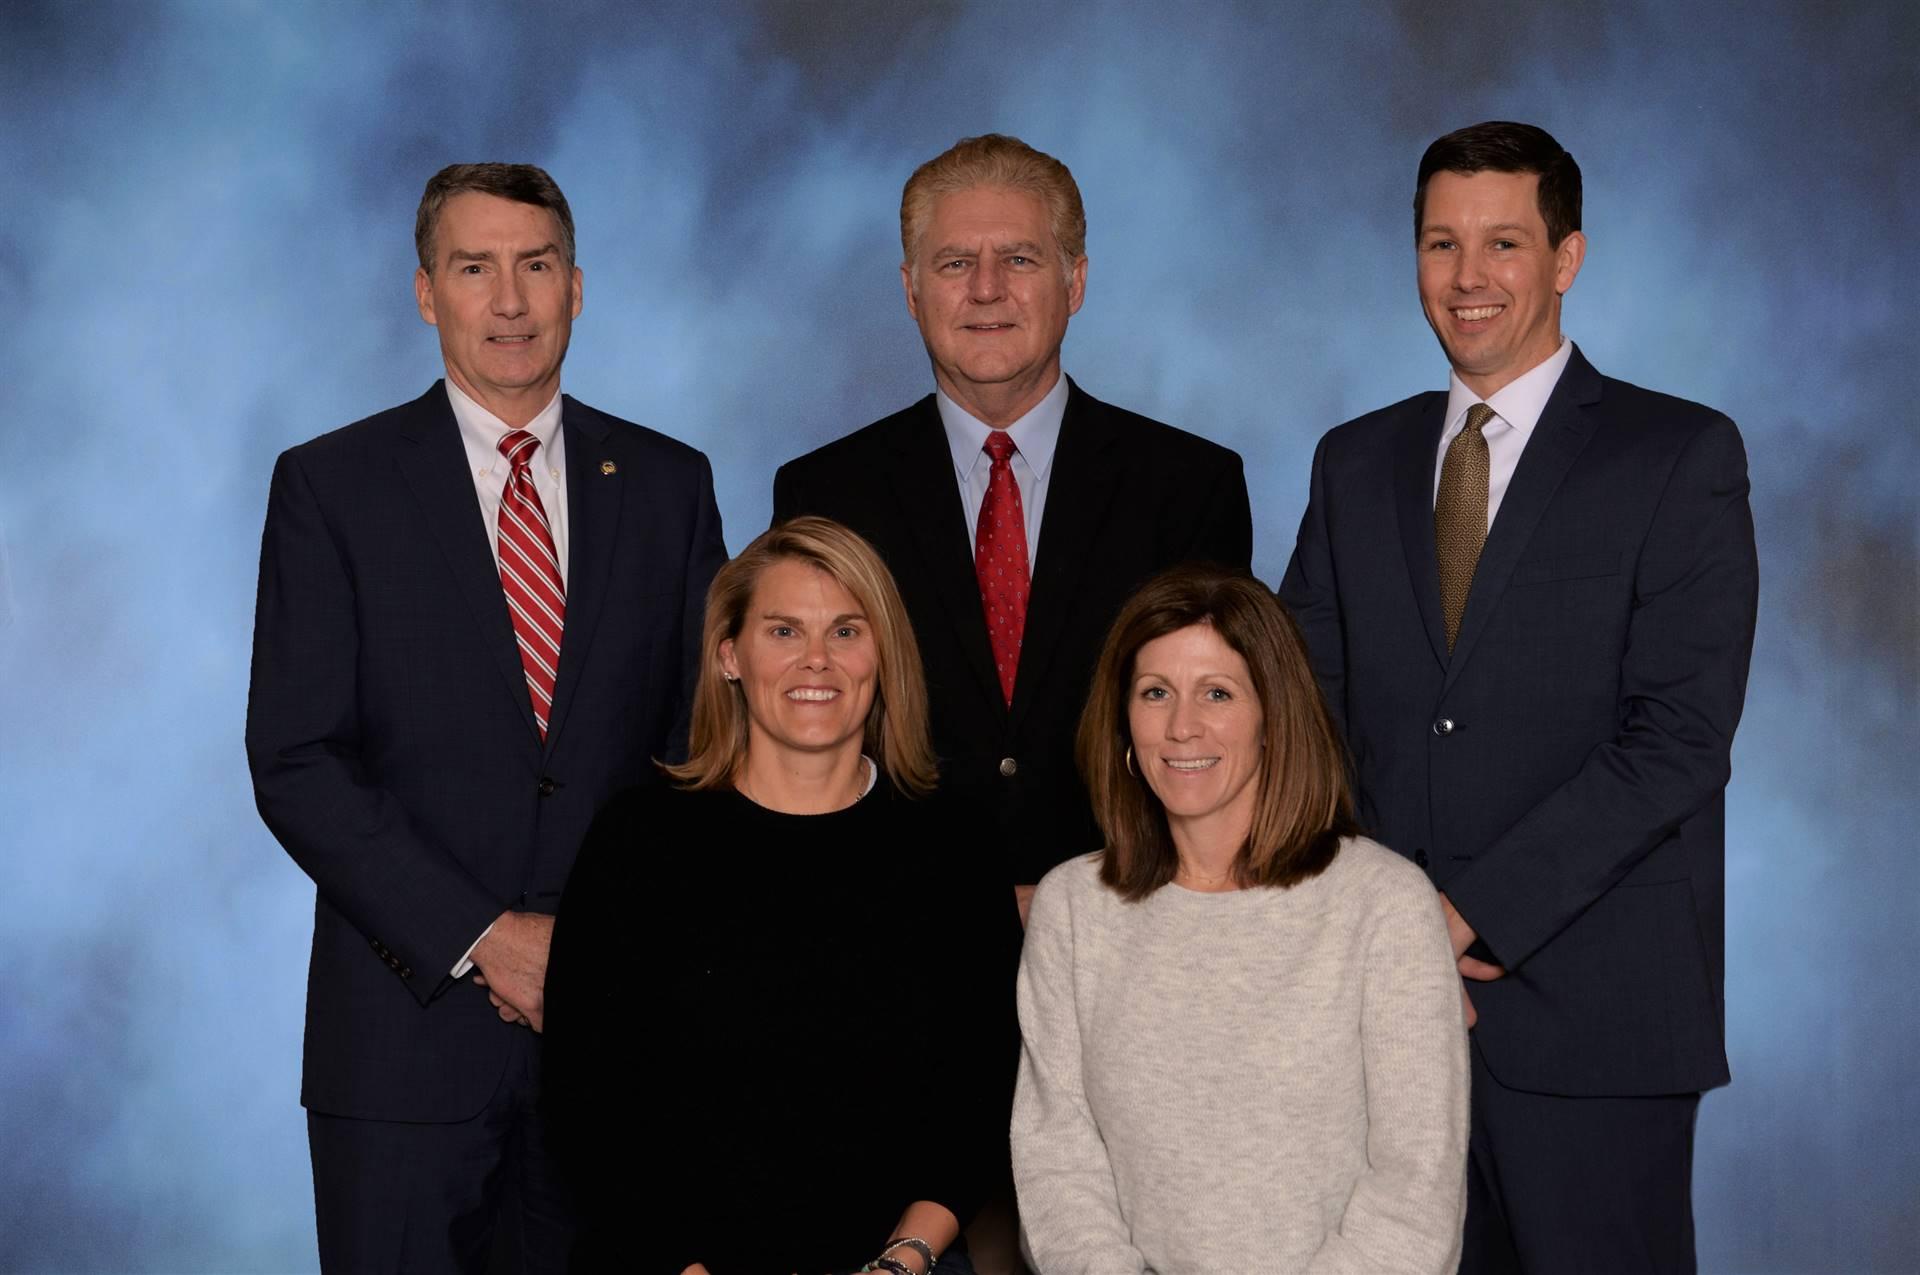 Five Board of Education members